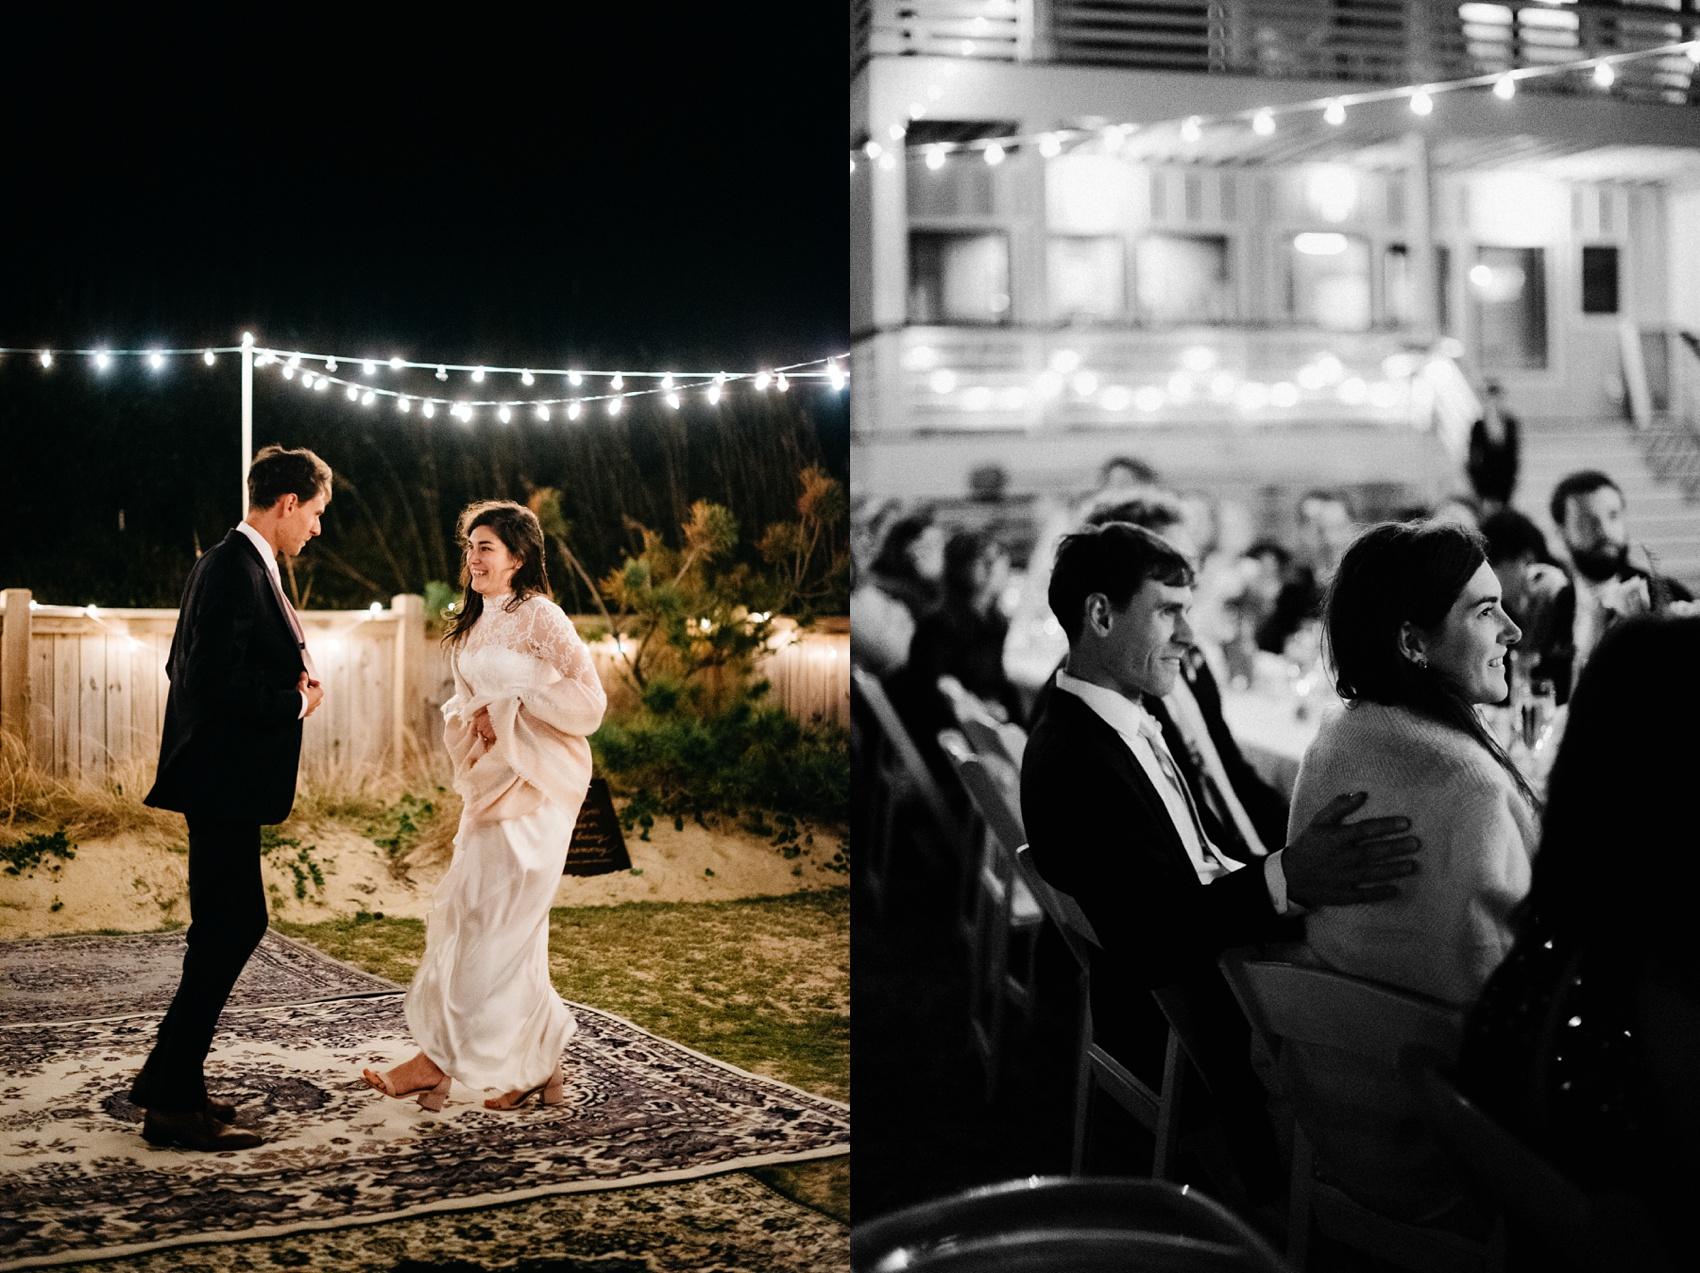 outerbanks_wedding_photographer_1334.jpg